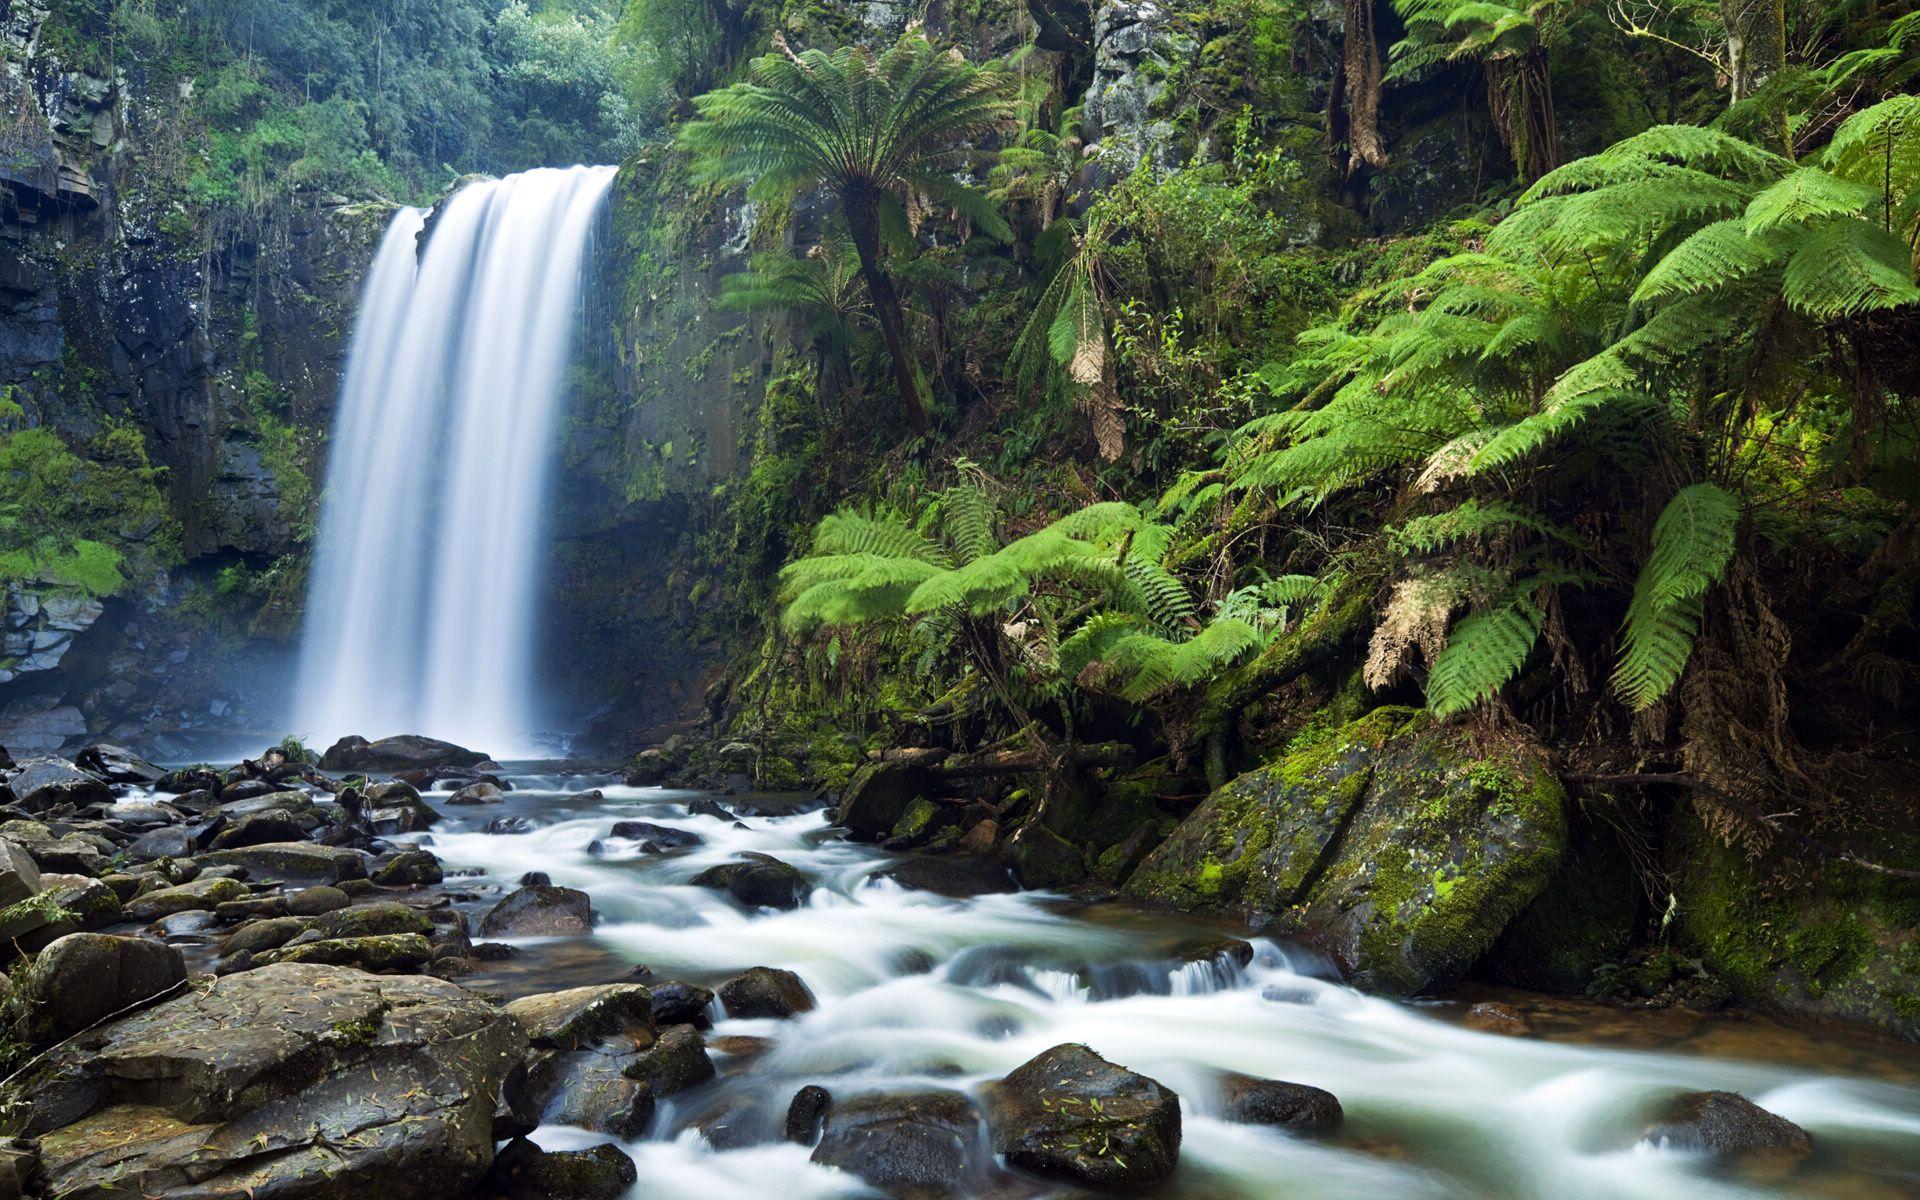 Victoria Falls Live Wallpaper Hd Wallpaper Download Waterfall Hd Wallpaper 1920x1200